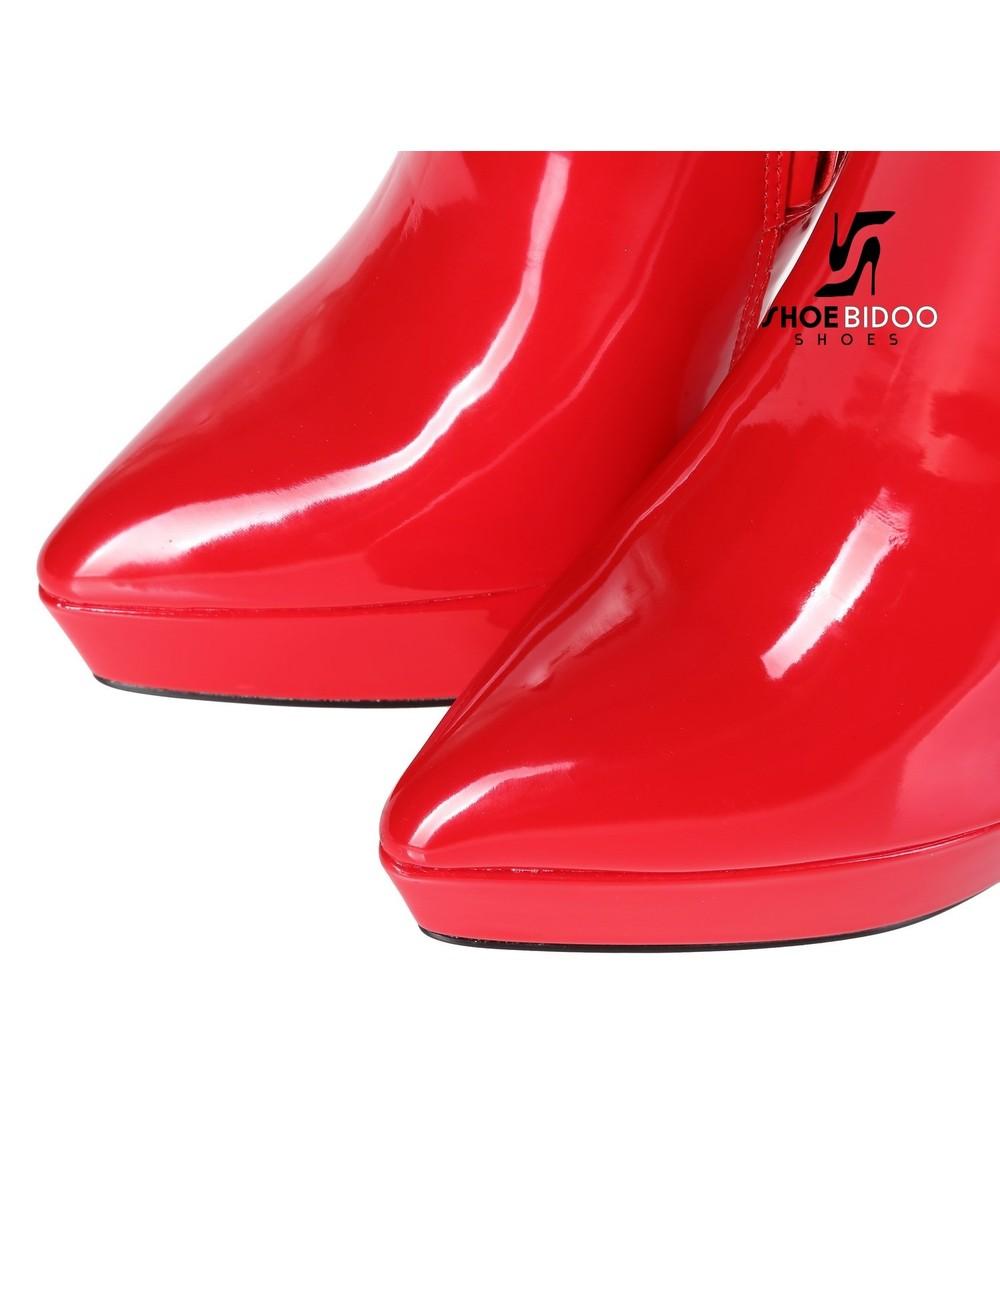 Giaro Giaro Platform knielaarzen SARAYA in rood lak